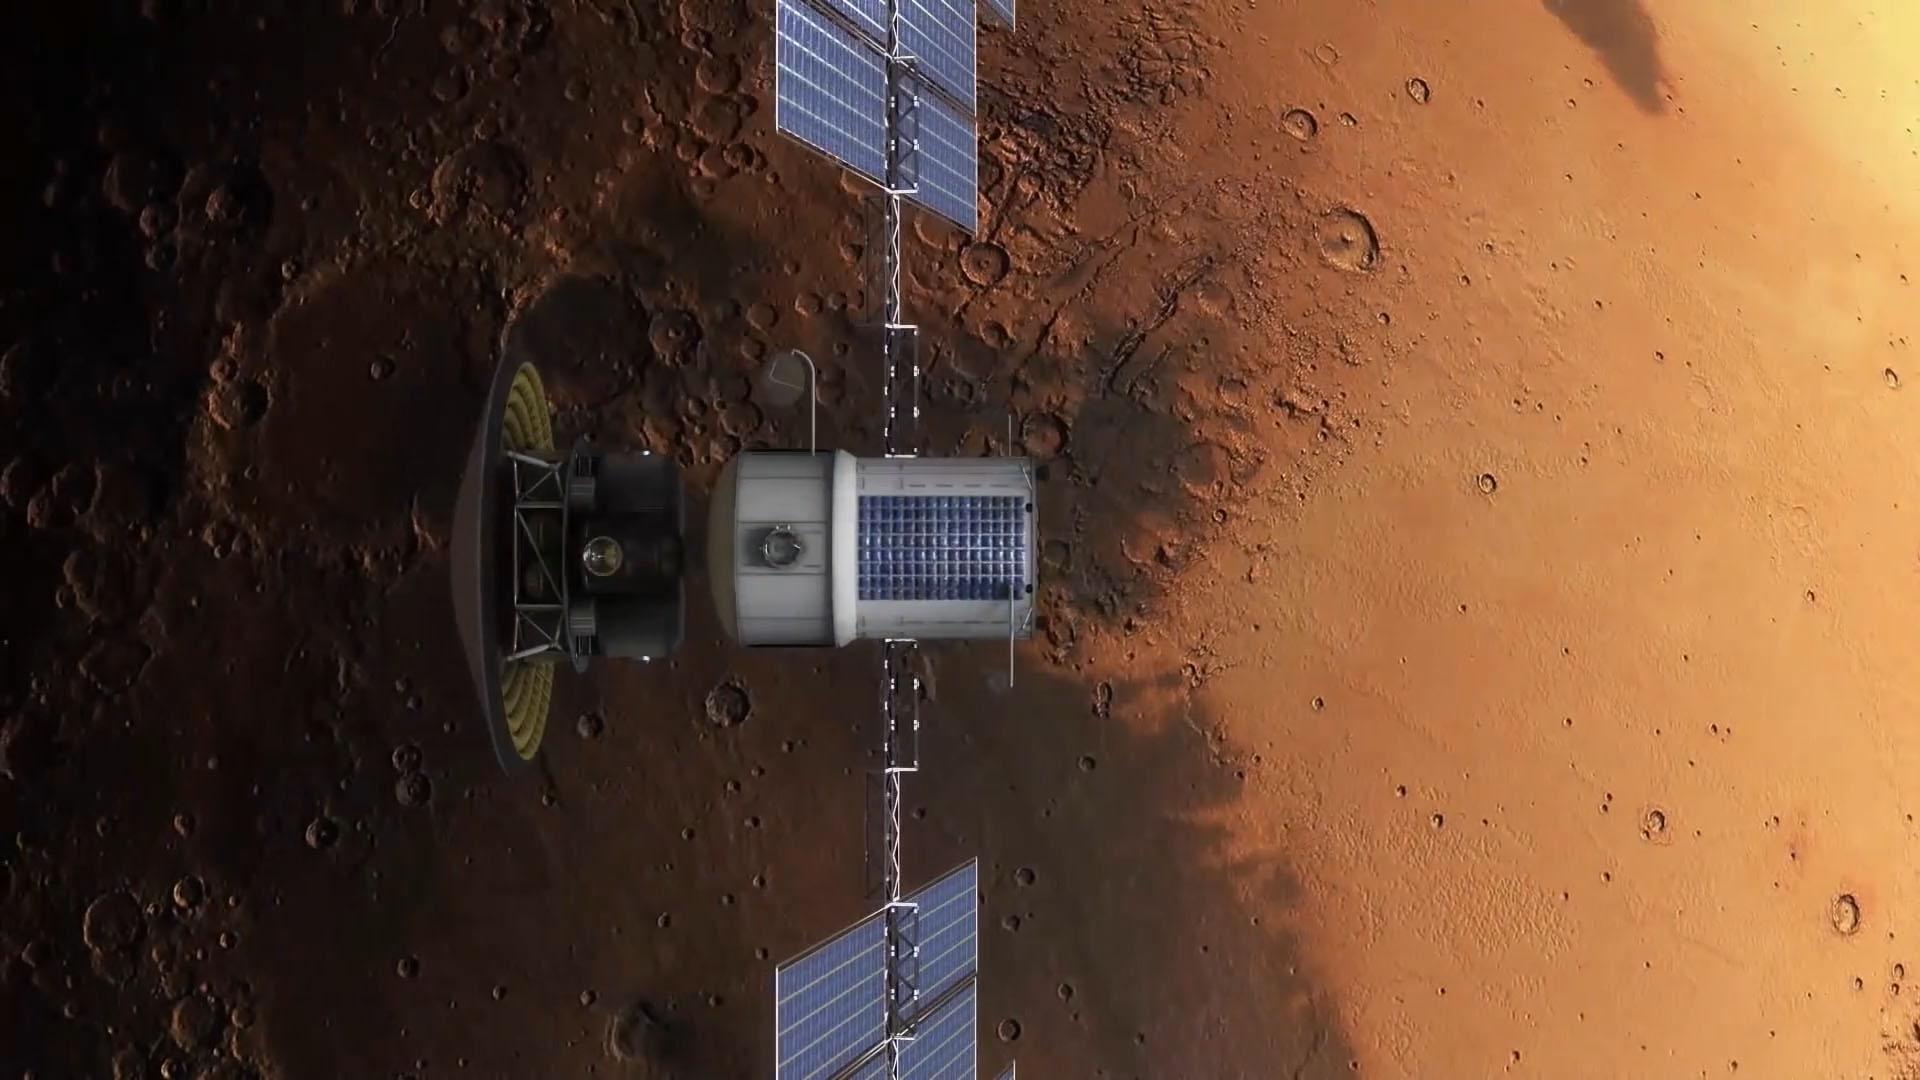 astronaut space radiation - photo #23